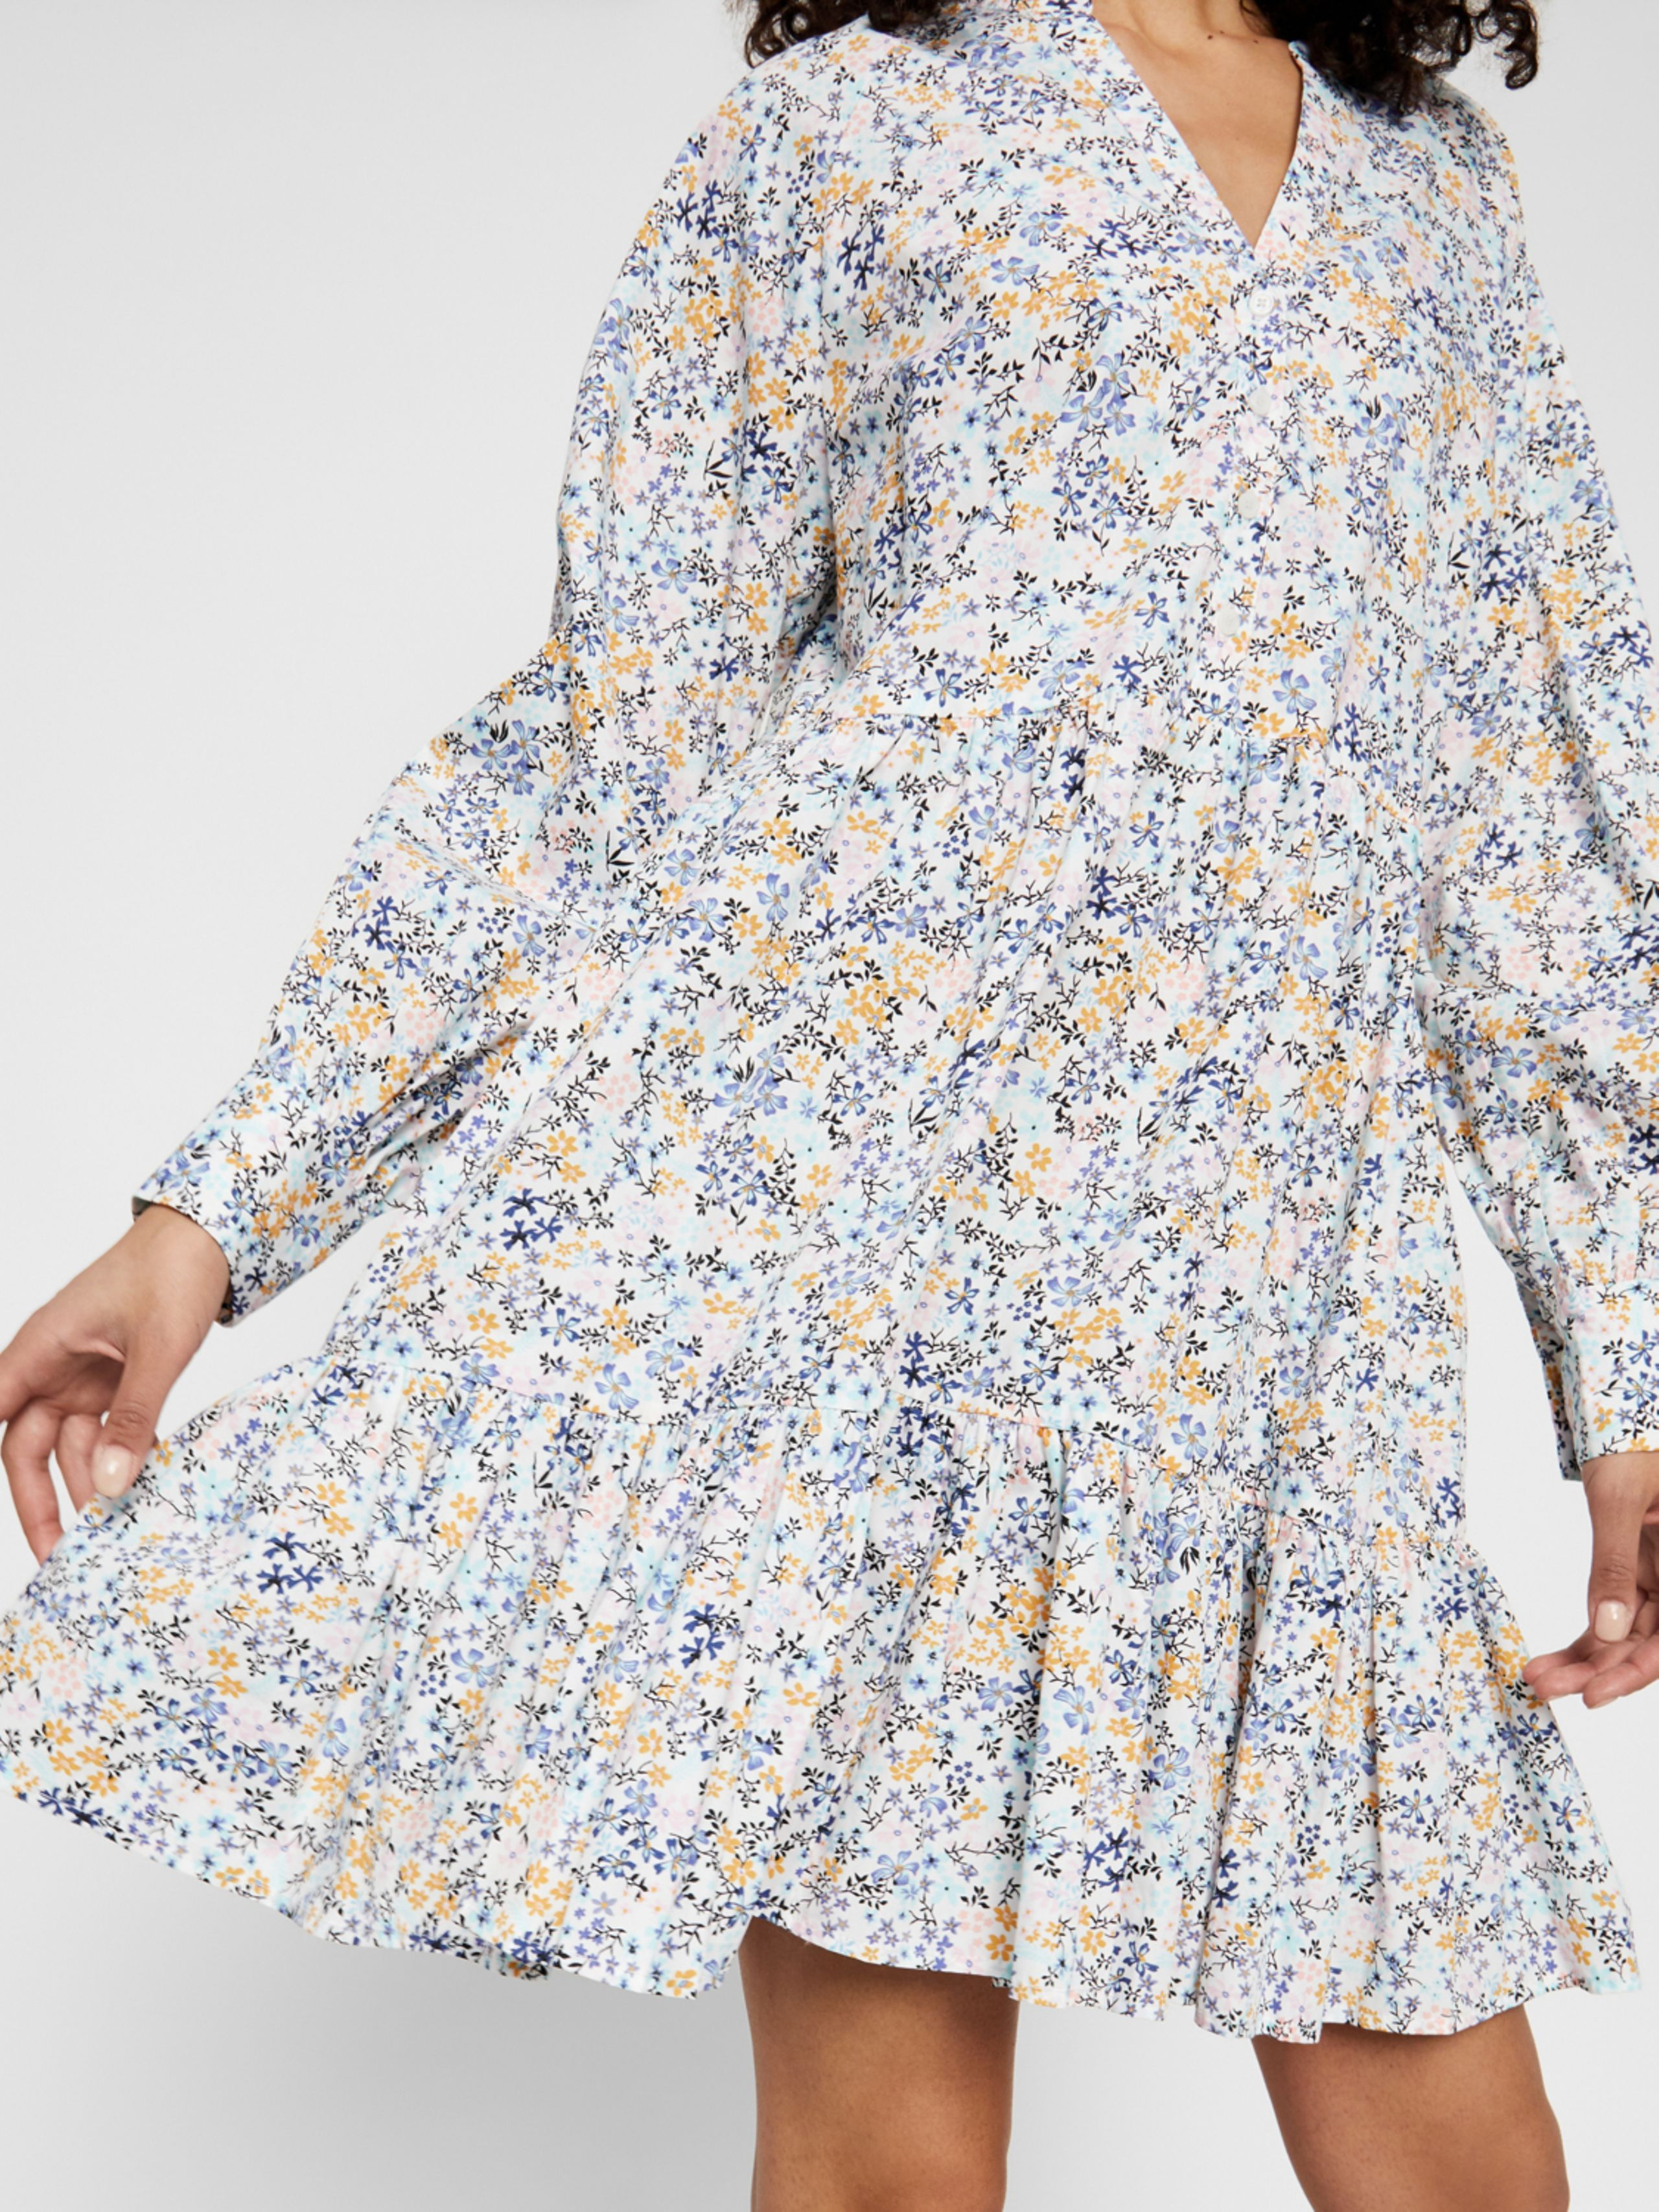 yasfielda dress